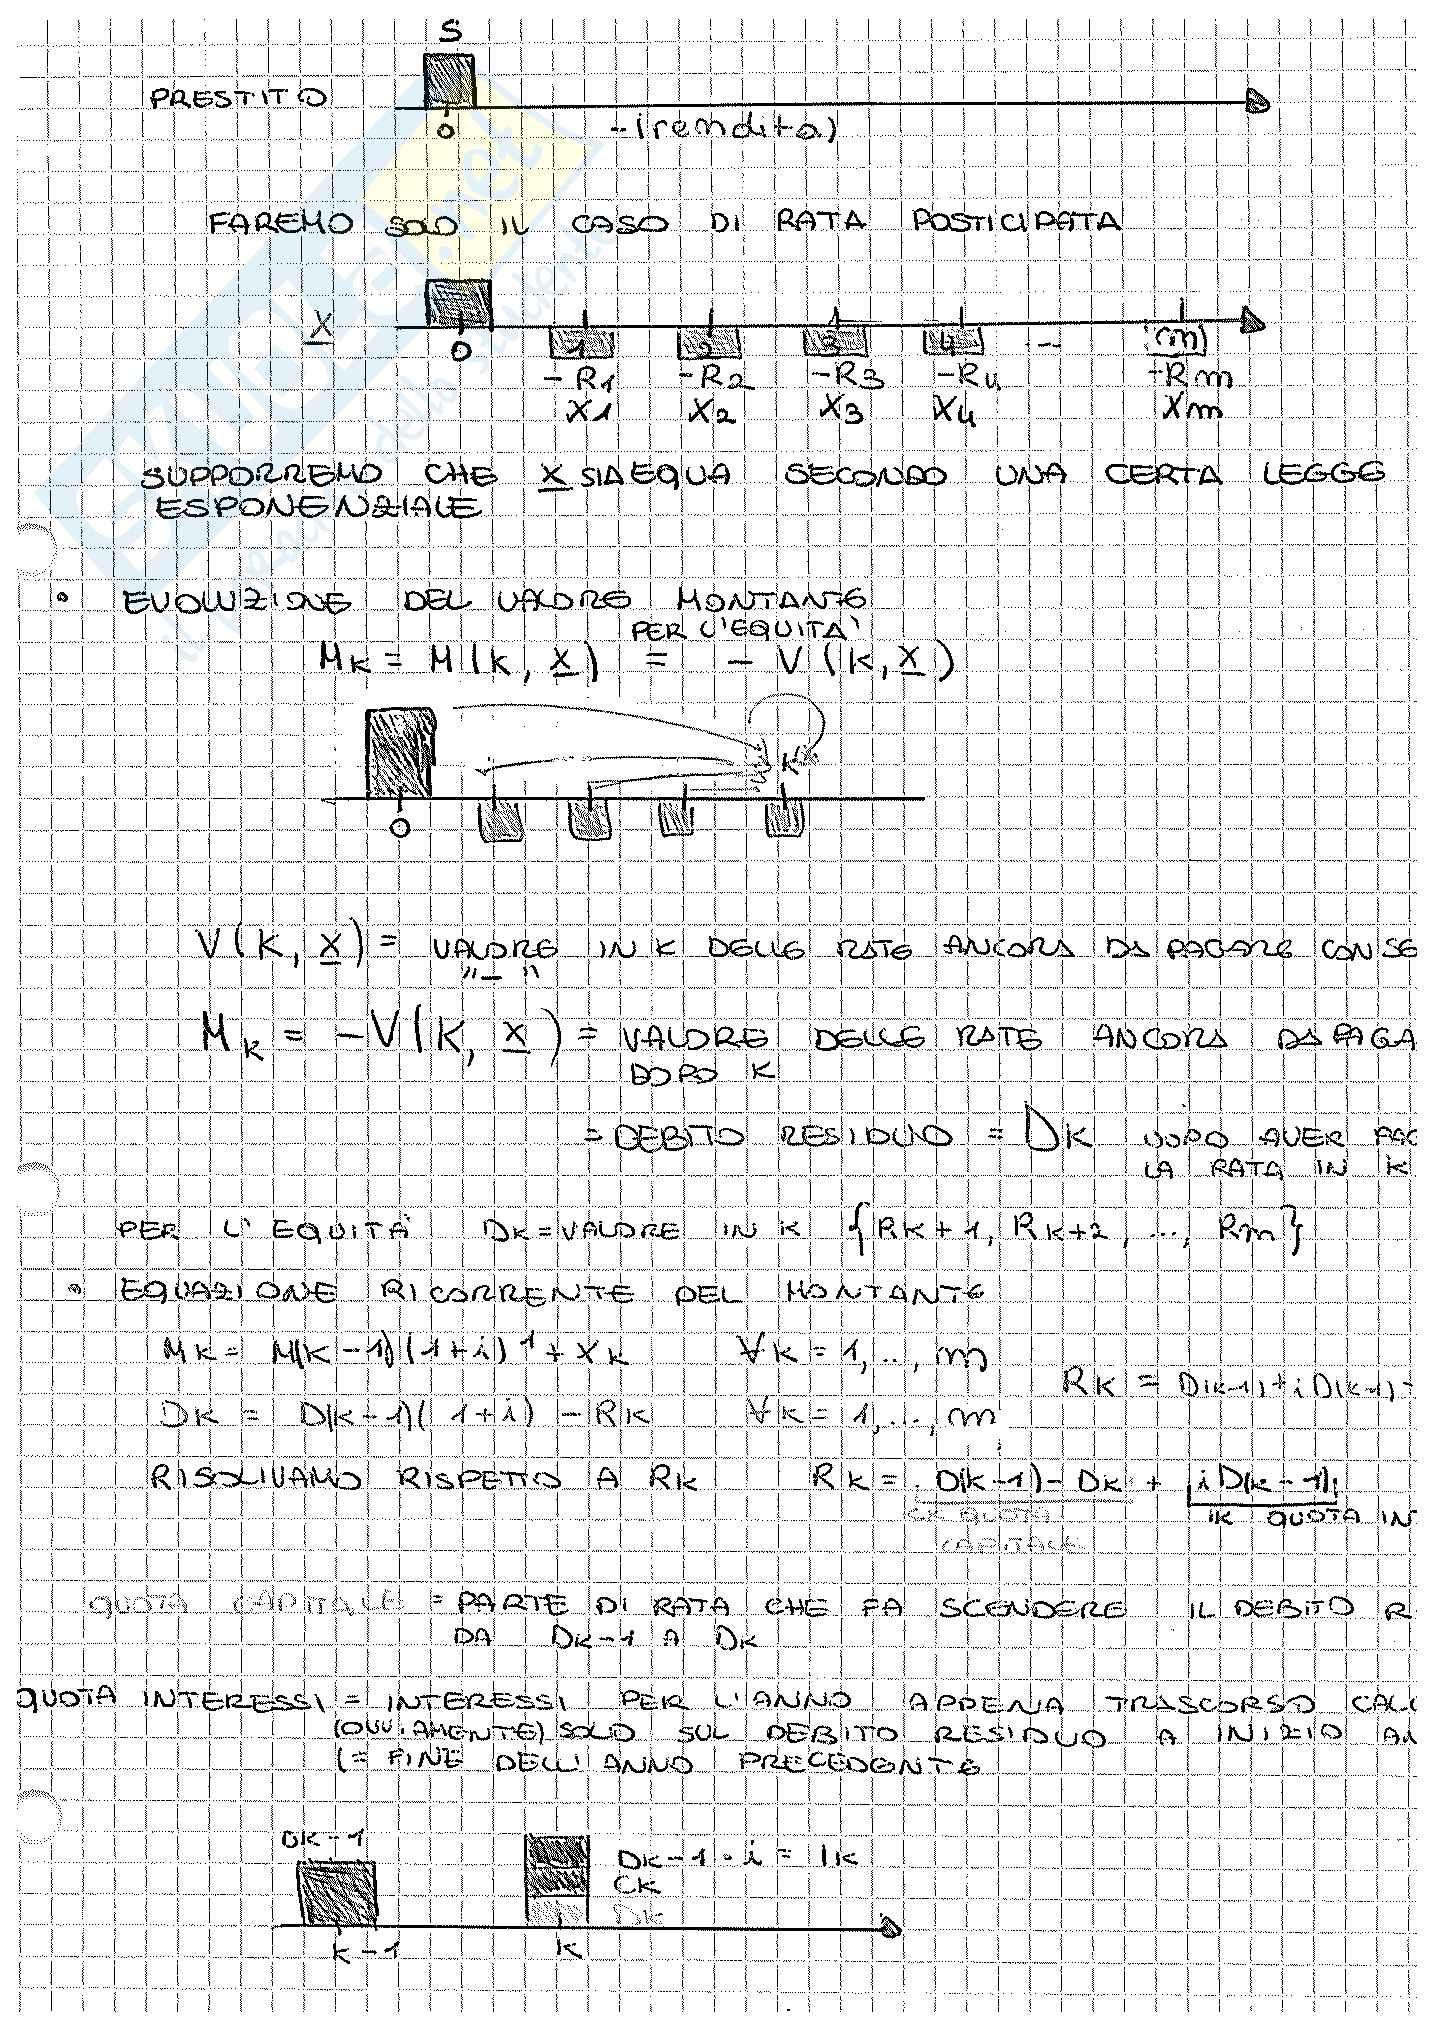 Appunti di Matematica Finanziaria, docente Claudio Pacati Pag. 41